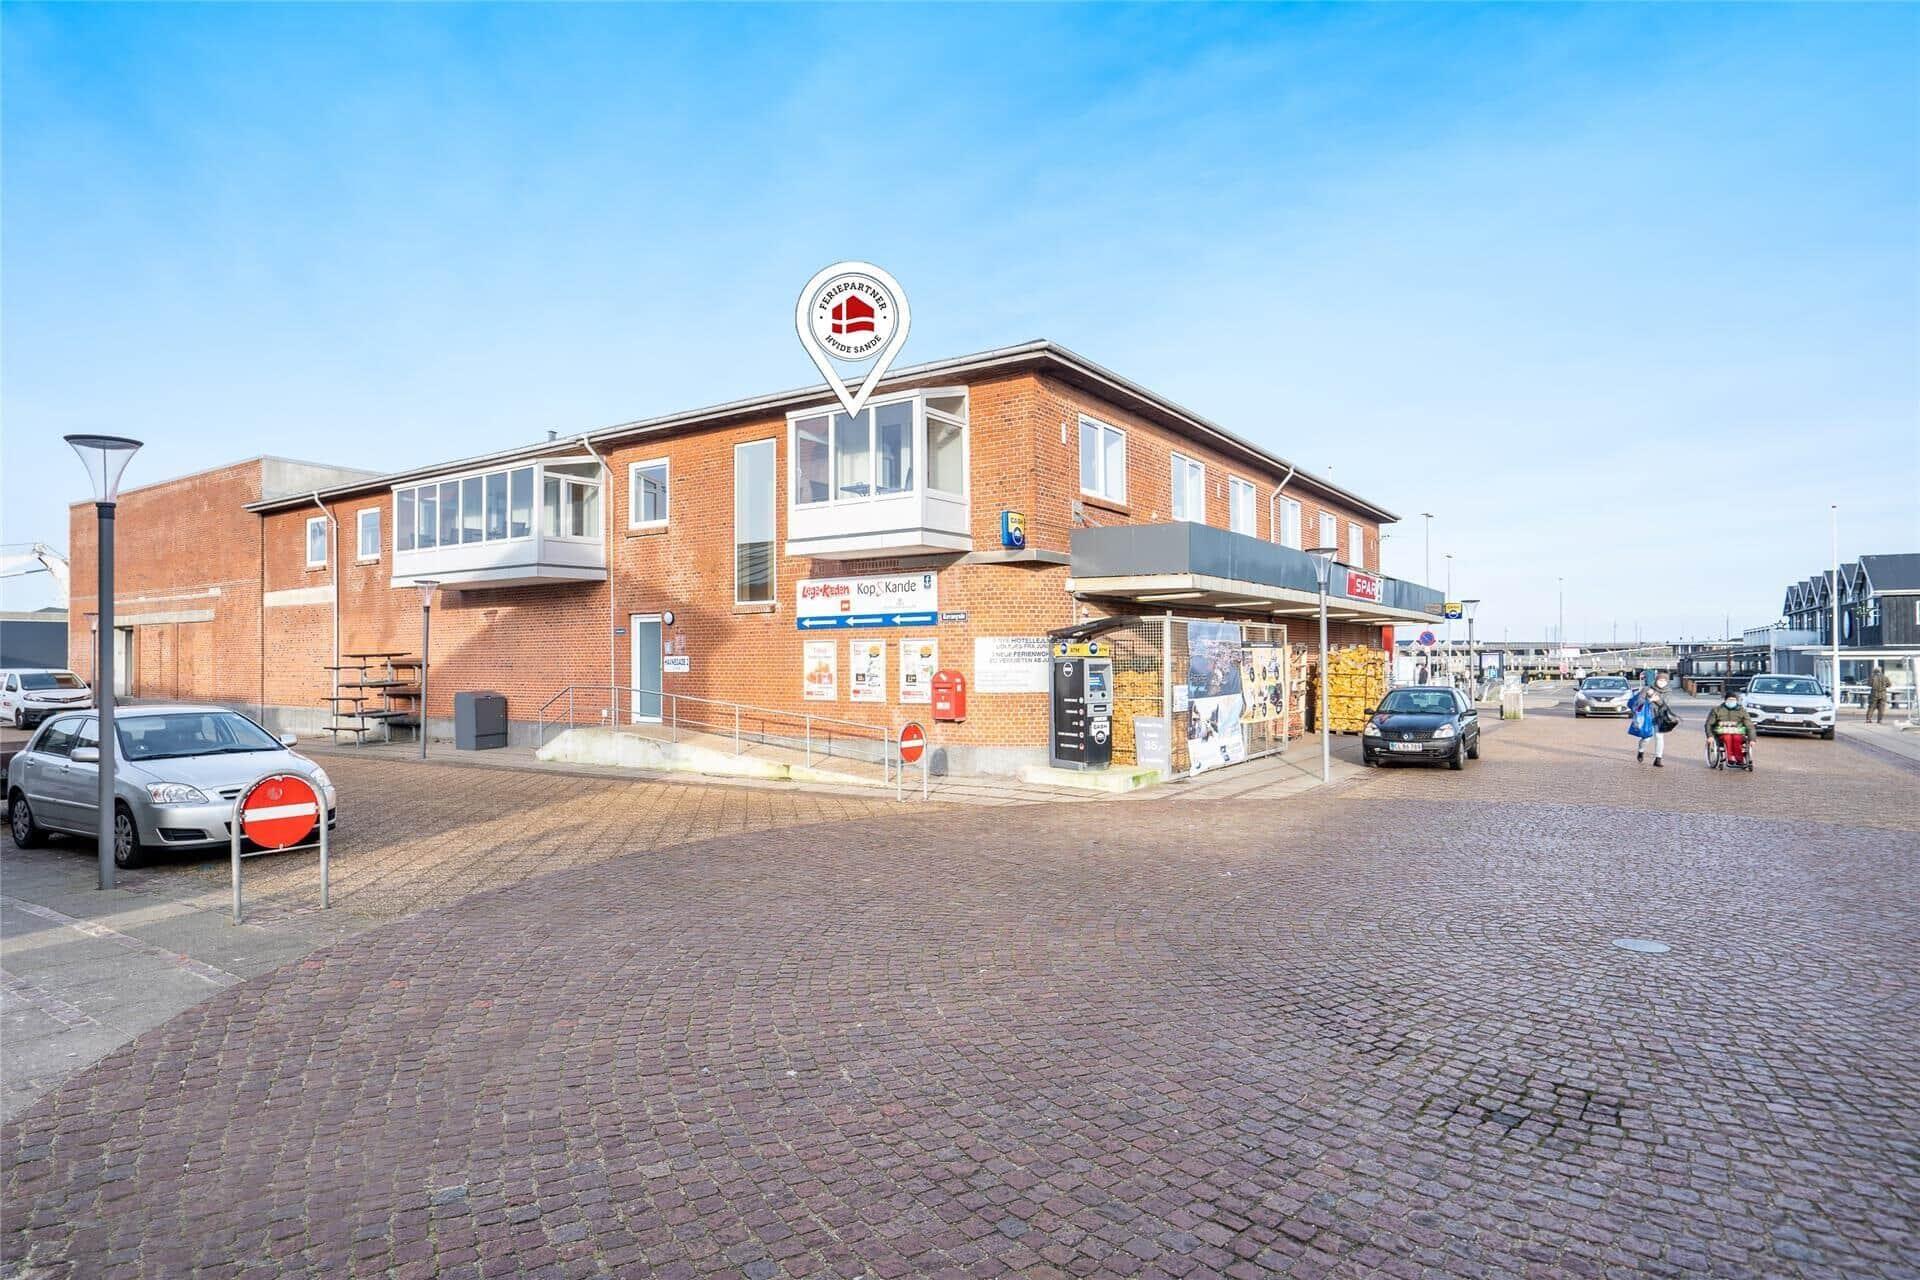 Bild 0-4 Ferienhaus 803, Havnegade 2, DK - 6960 Hvide Sande